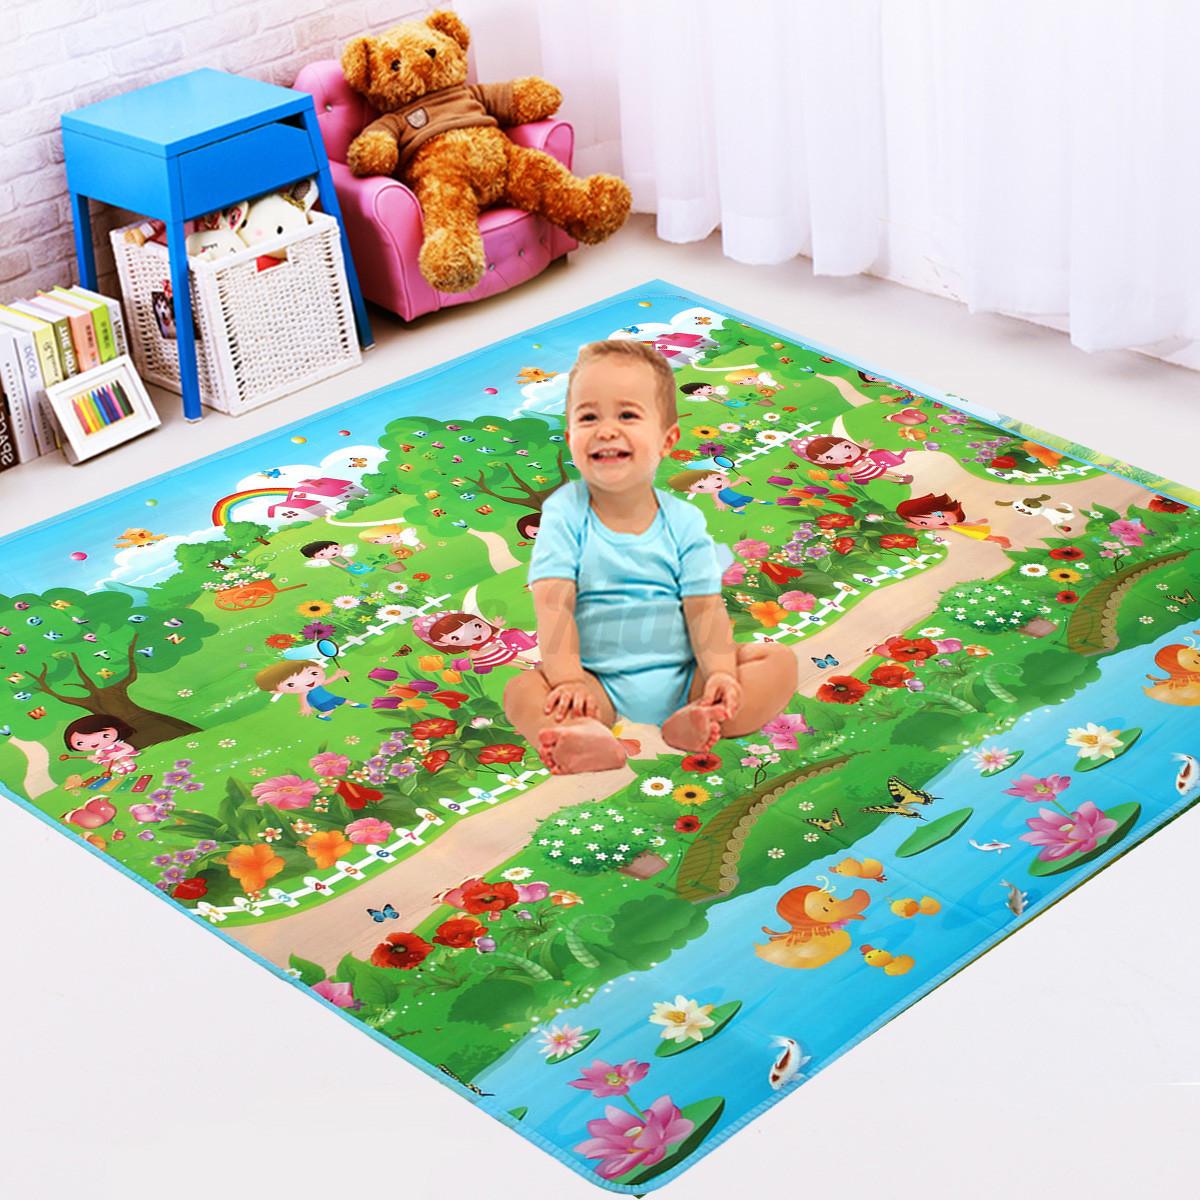 Baby Kids Play Mat Foam Floor Child Activity Soft Toy Gym